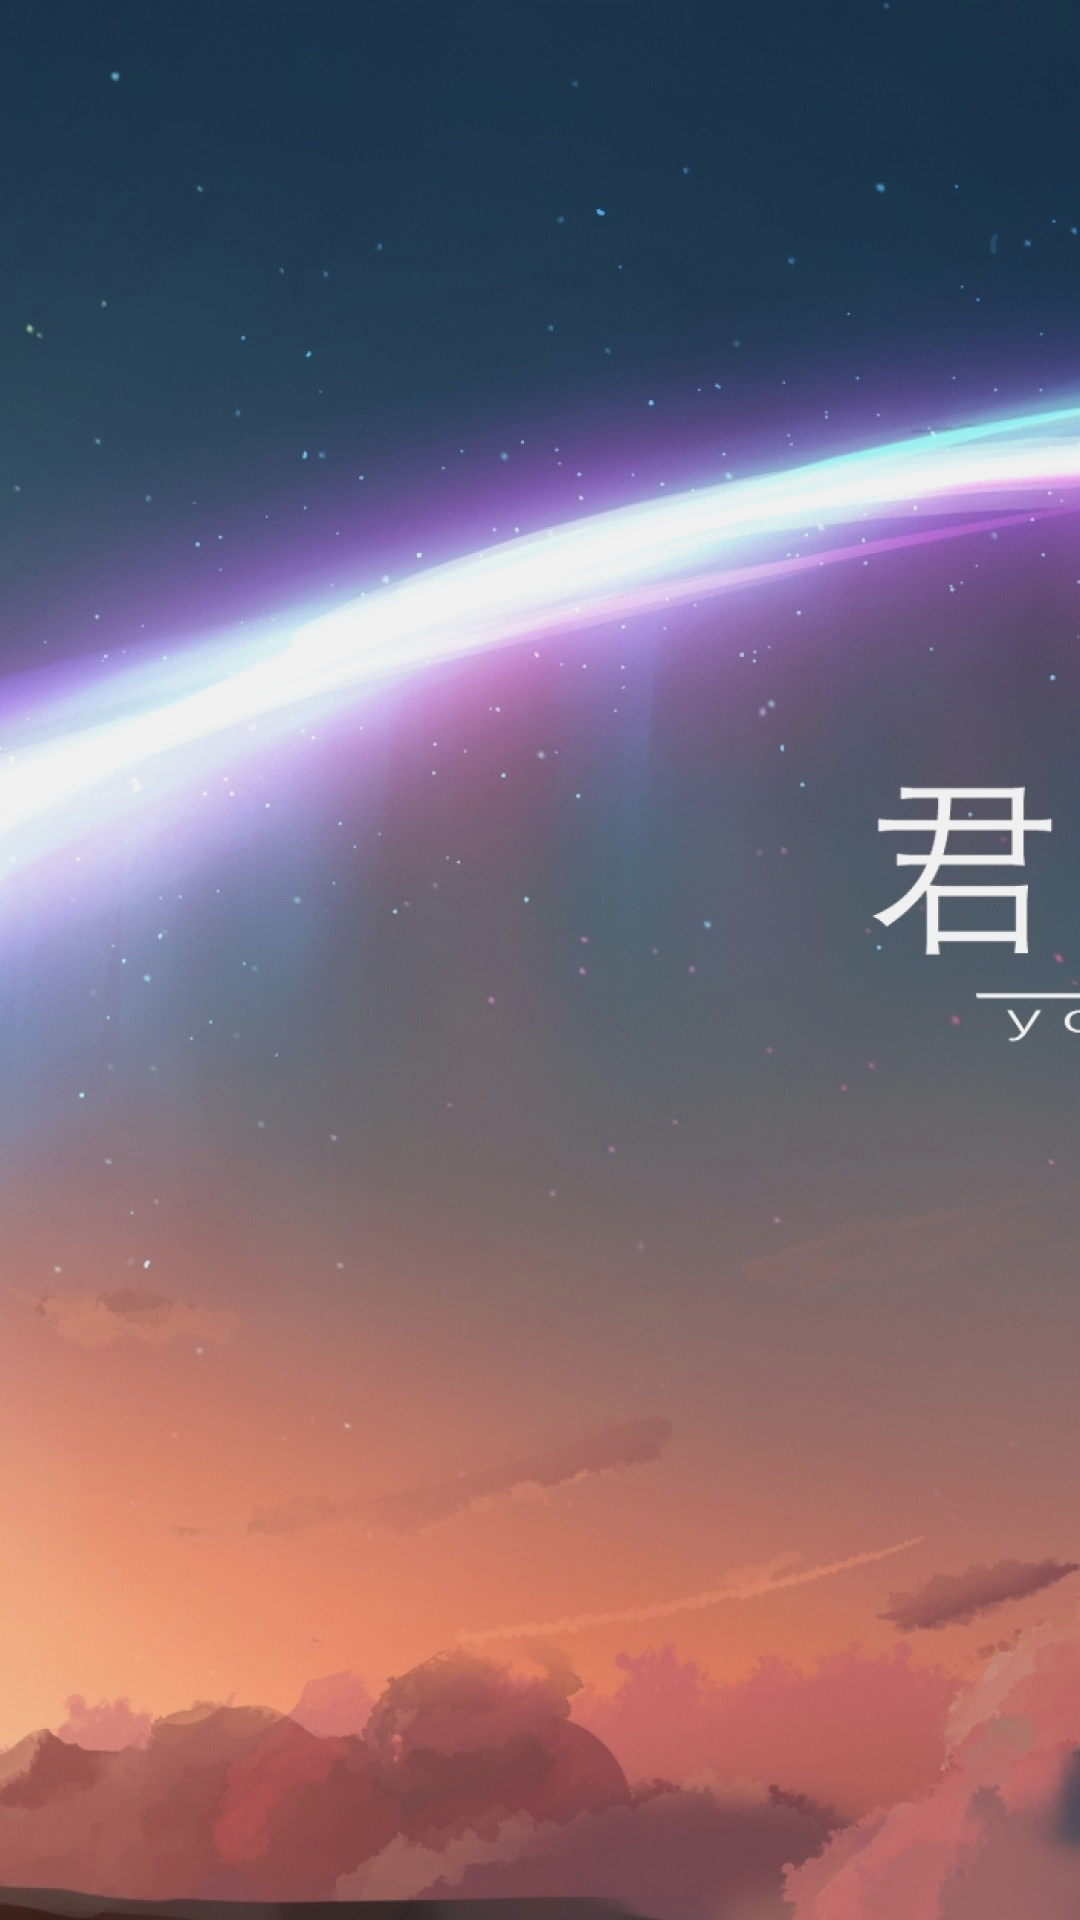 Kimi No Nawa Wallpaper Kimi No Nawa Wallpaper Iphone Hd 1080x1920 Download Hd Wallpaper Wallpapertip